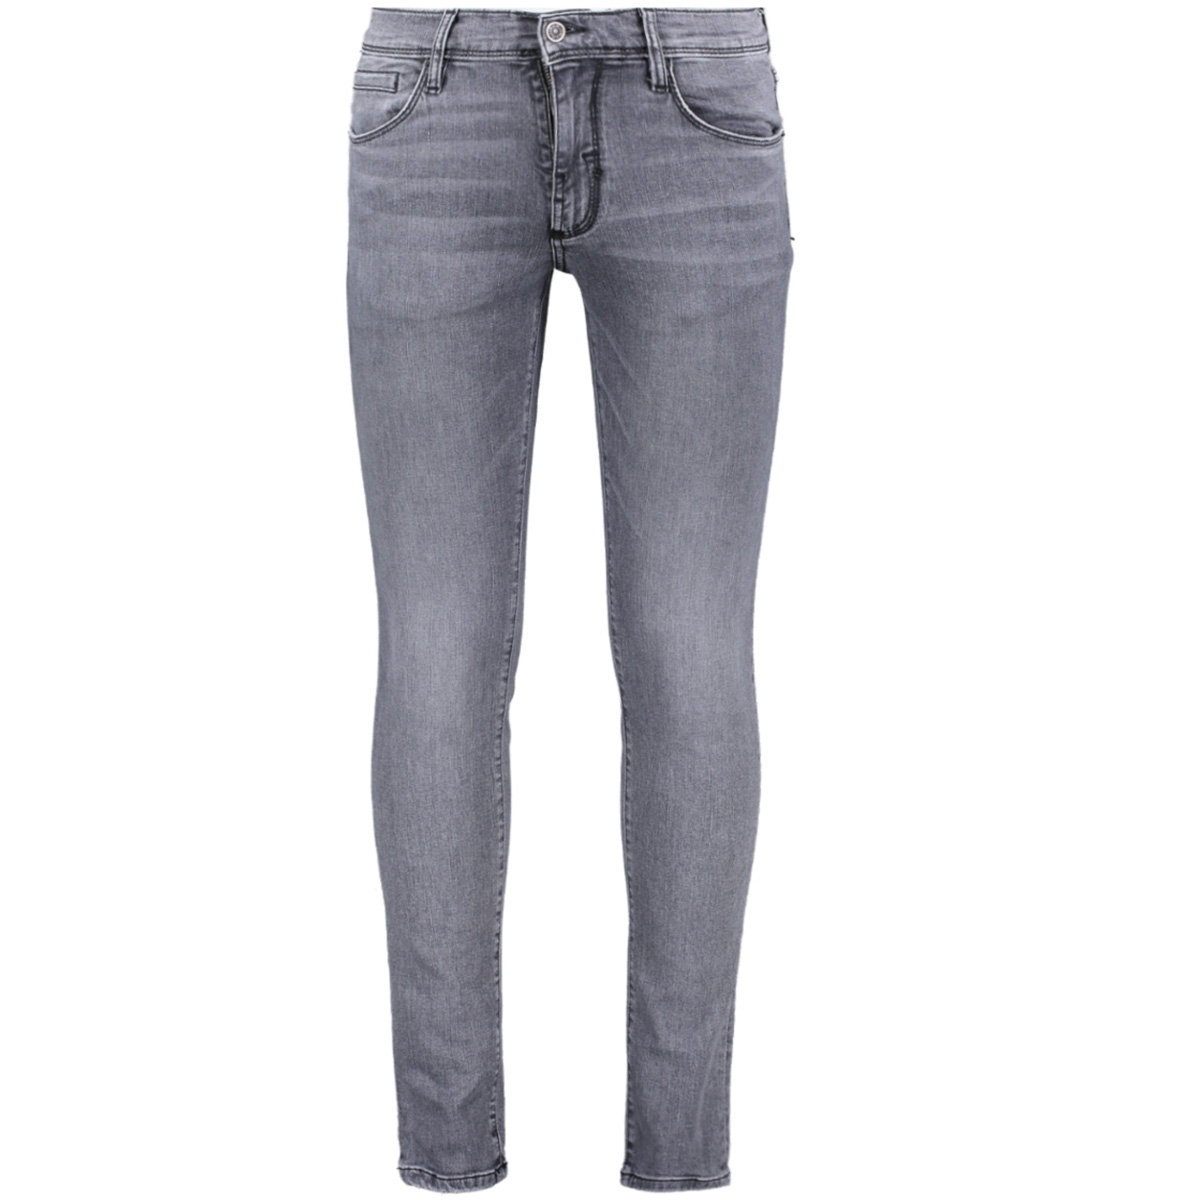 new gilmour mmdt00235 antony morato jeans 9001 greey steel